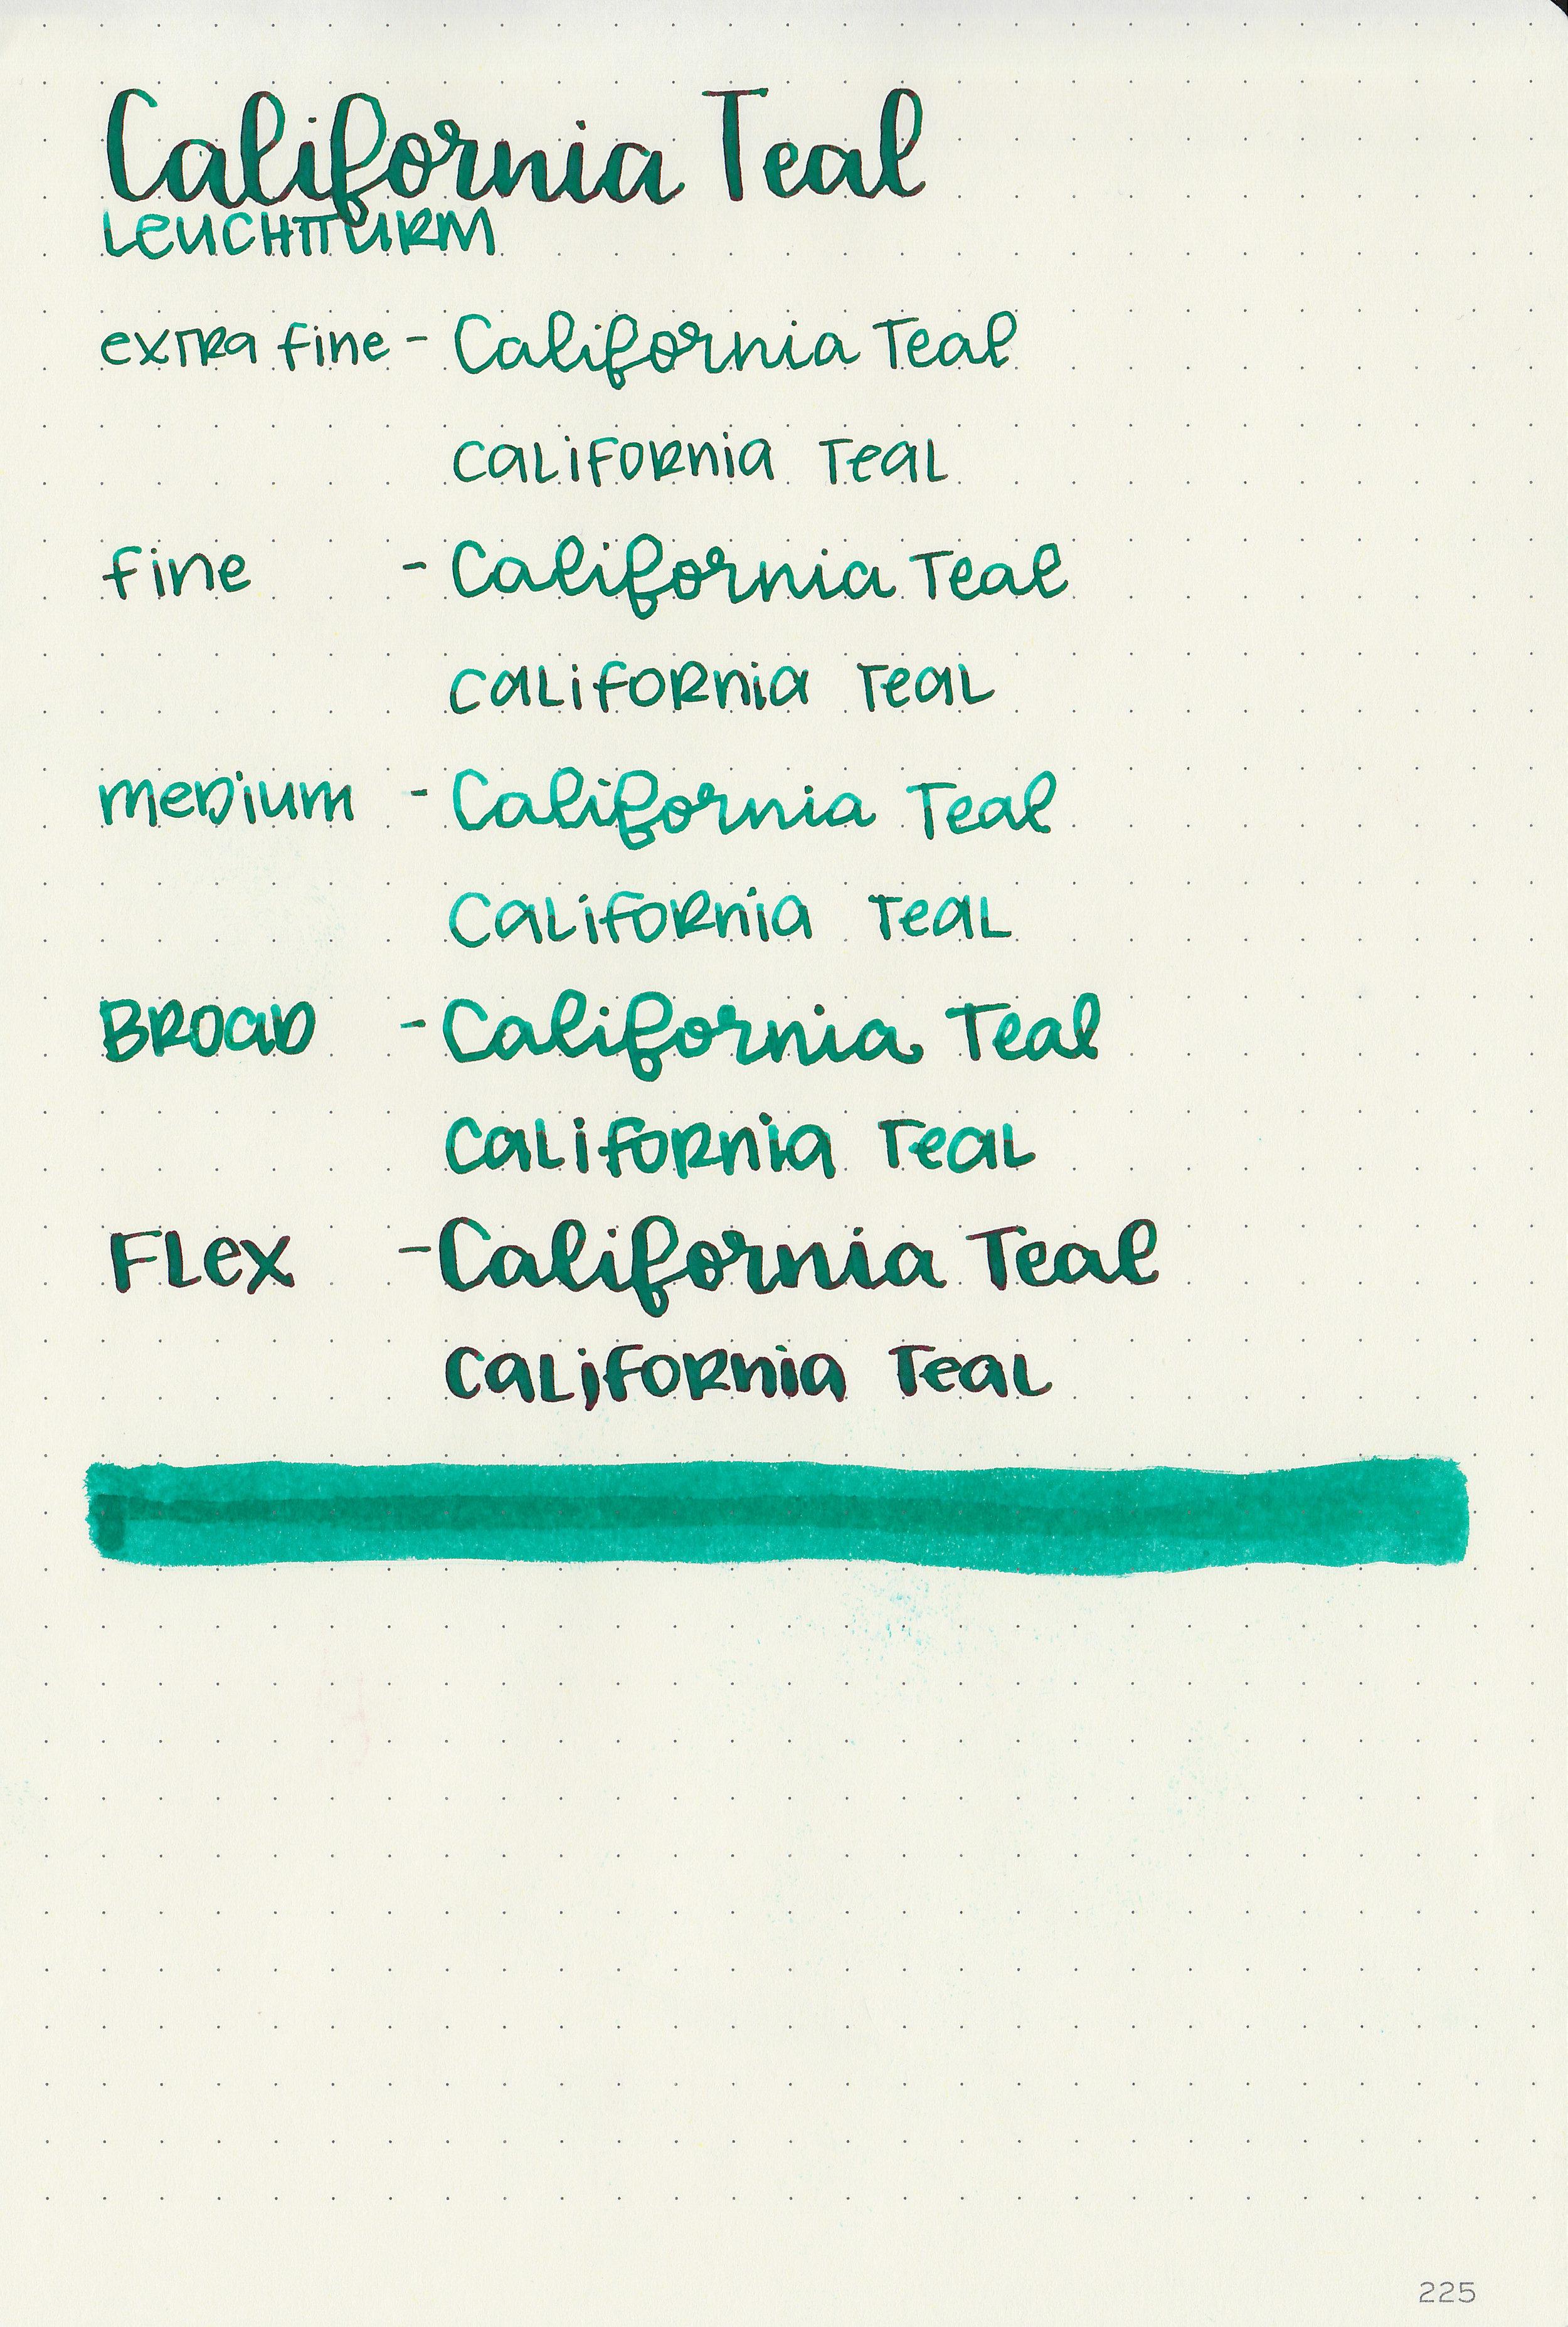 mv-california-teal-9.jpg